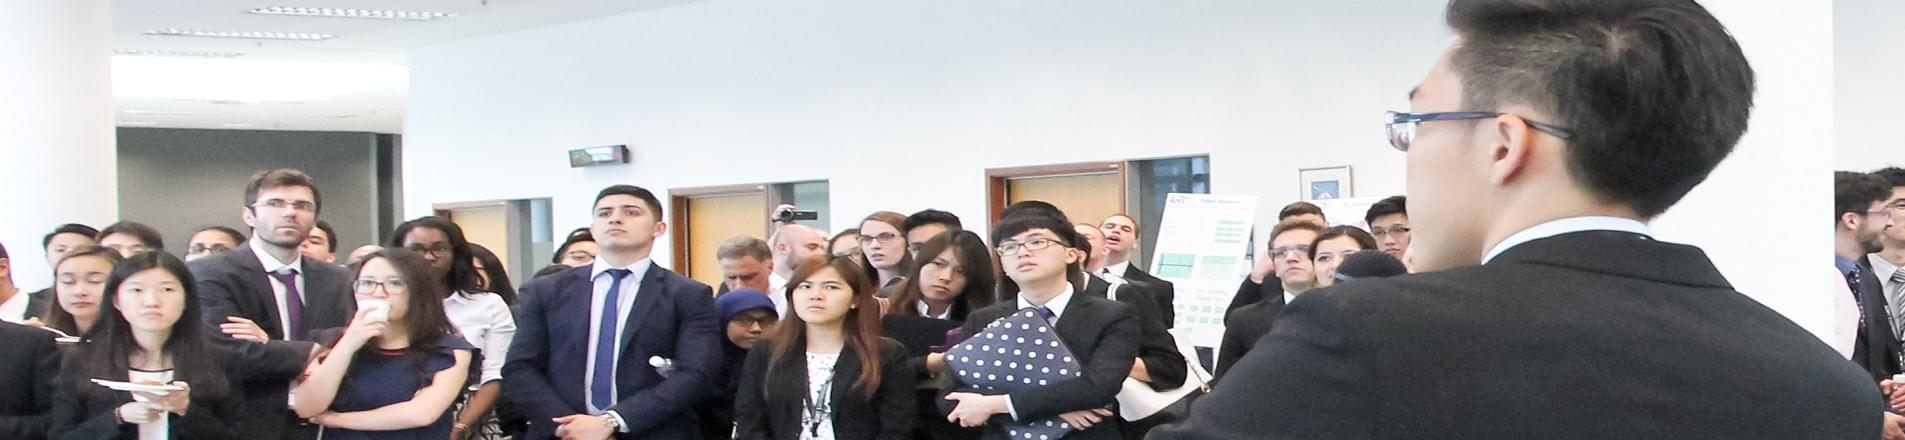 Lloyds: Recruiters should make business case for diversity